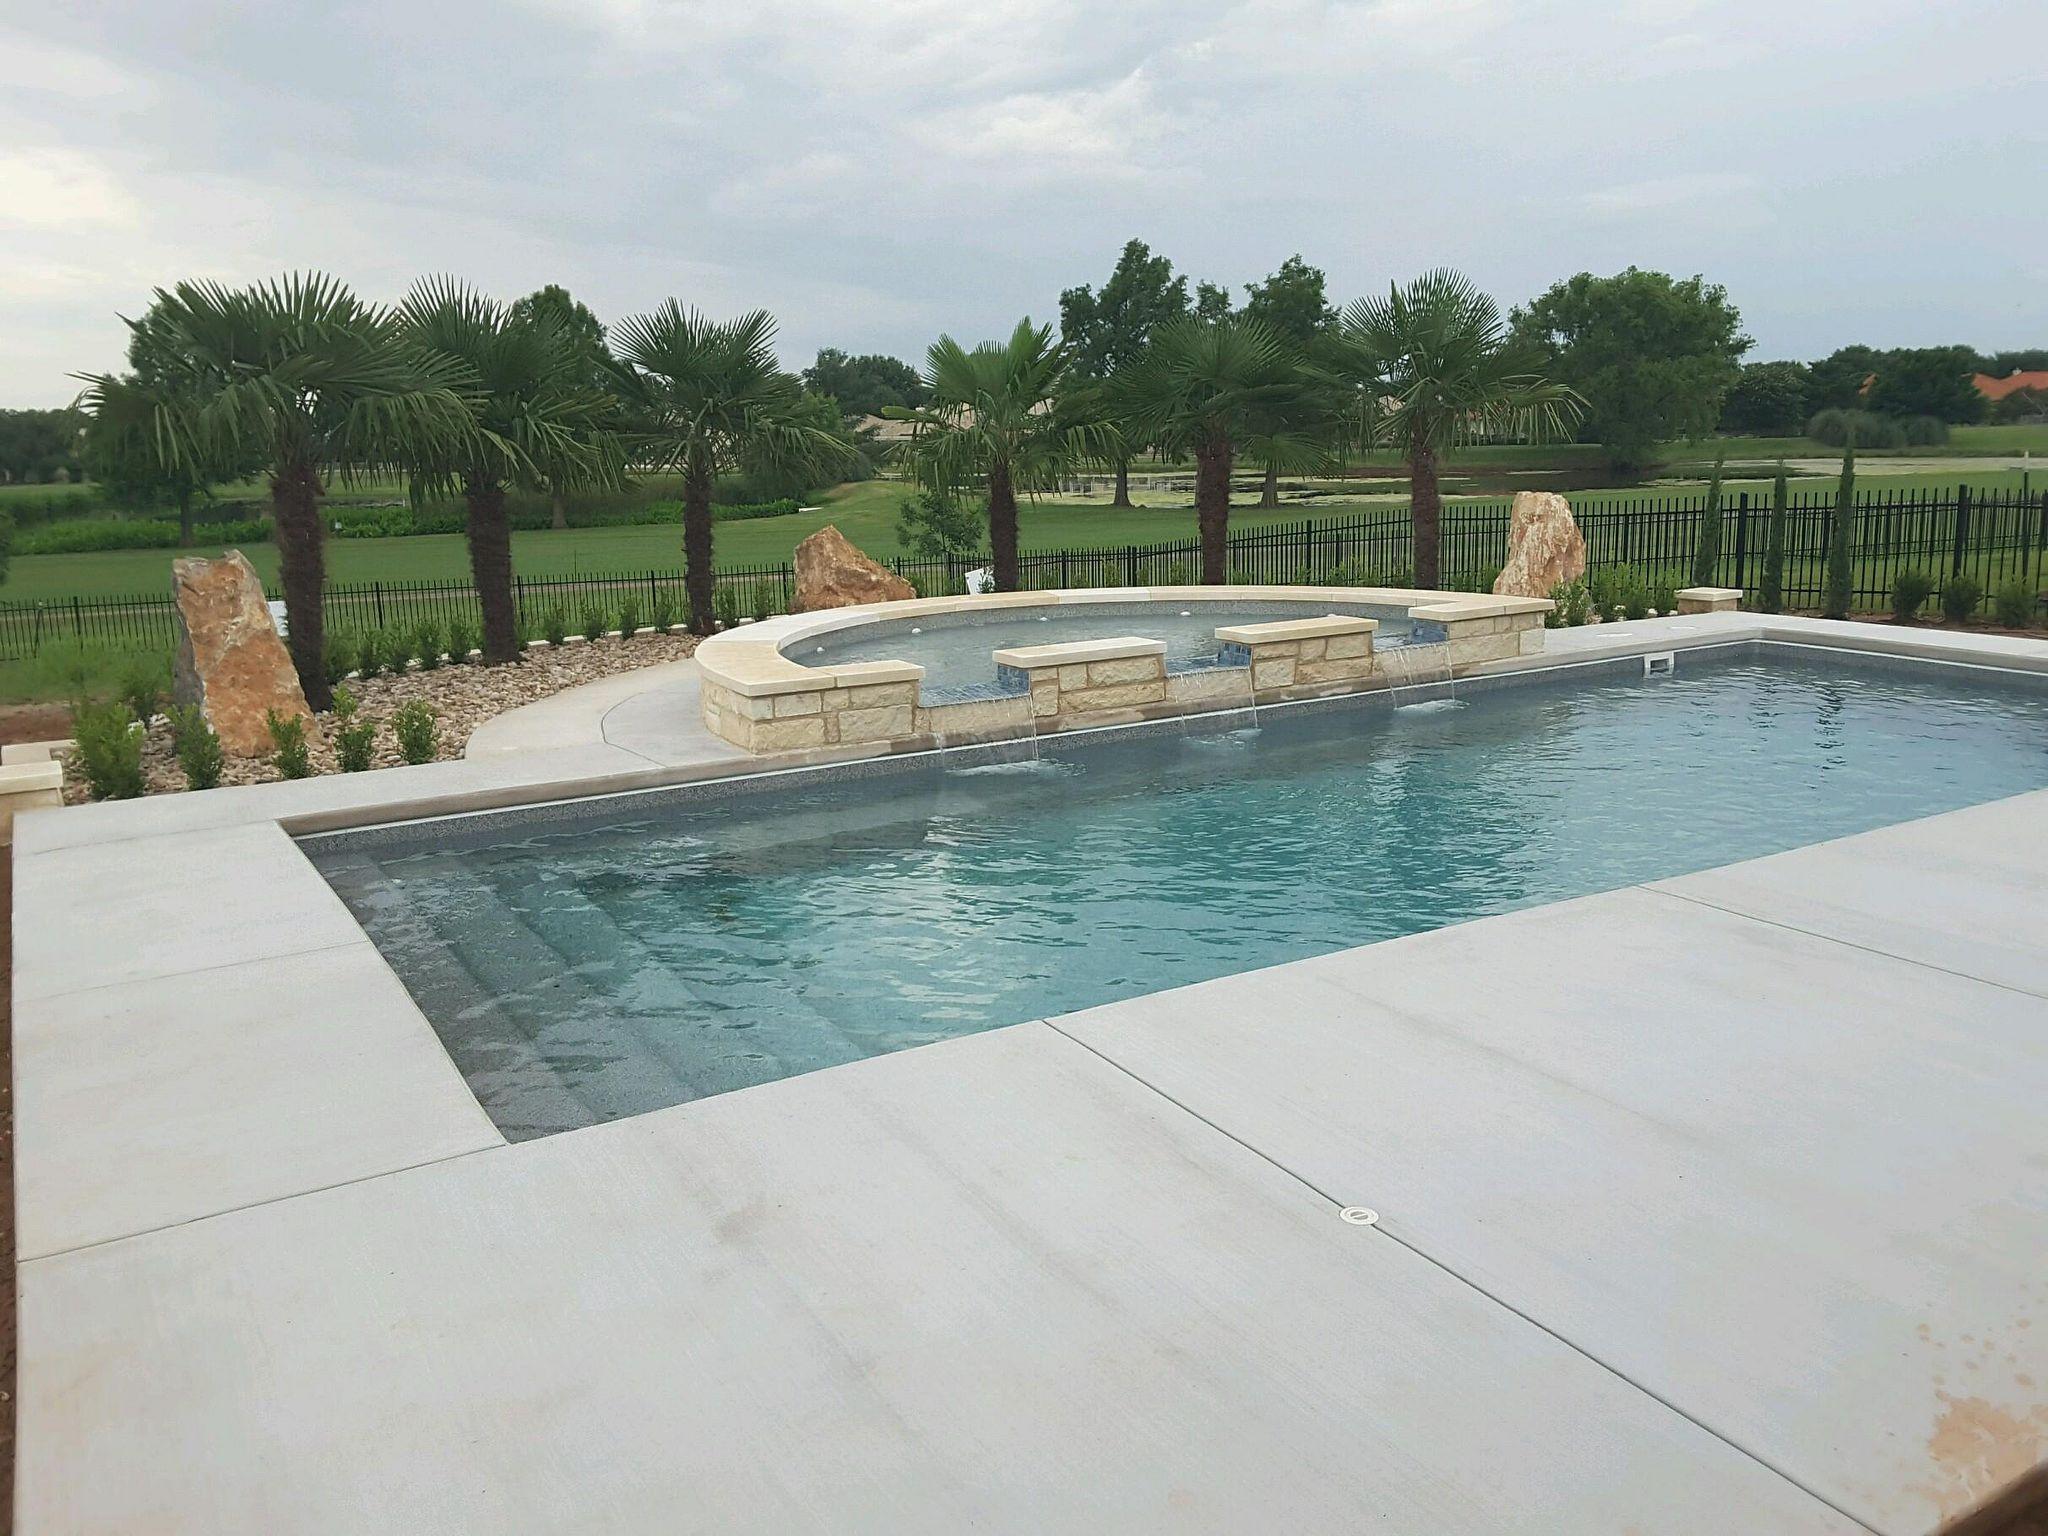 claremont fiberglass pool by aquamarine pools of texas with semi